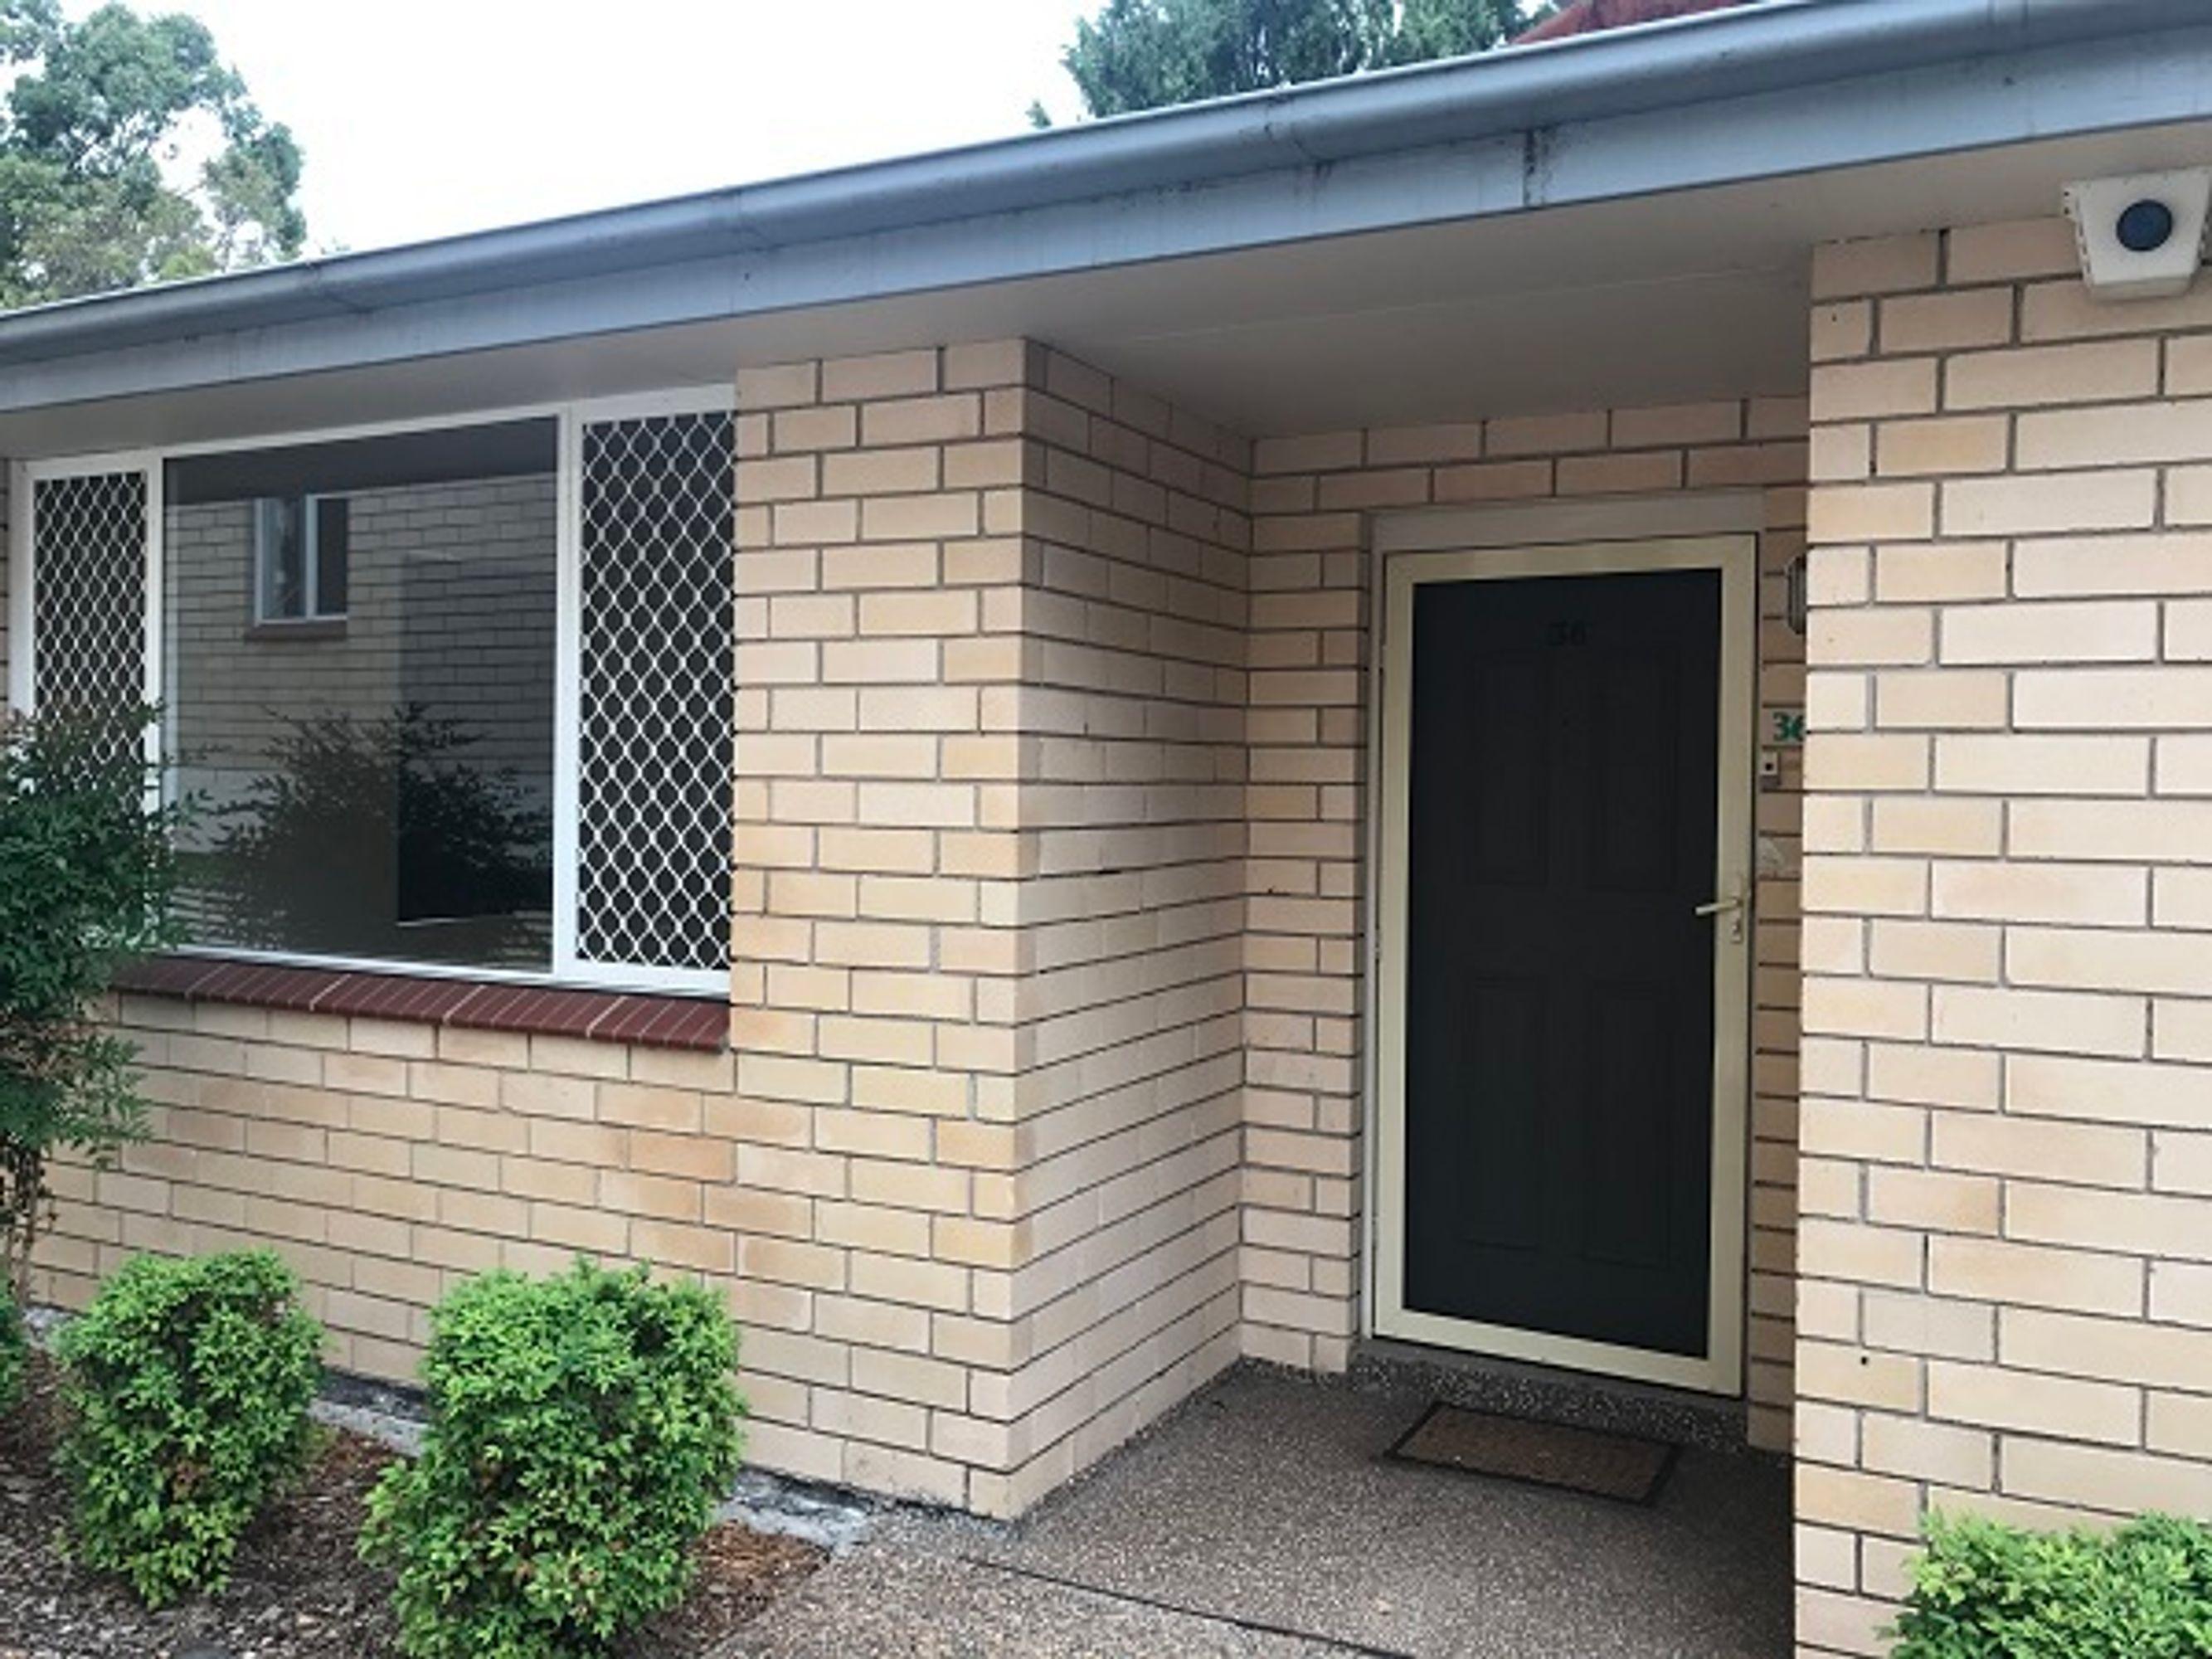 36/125 Park Road, Rydalmere, NSW 2116